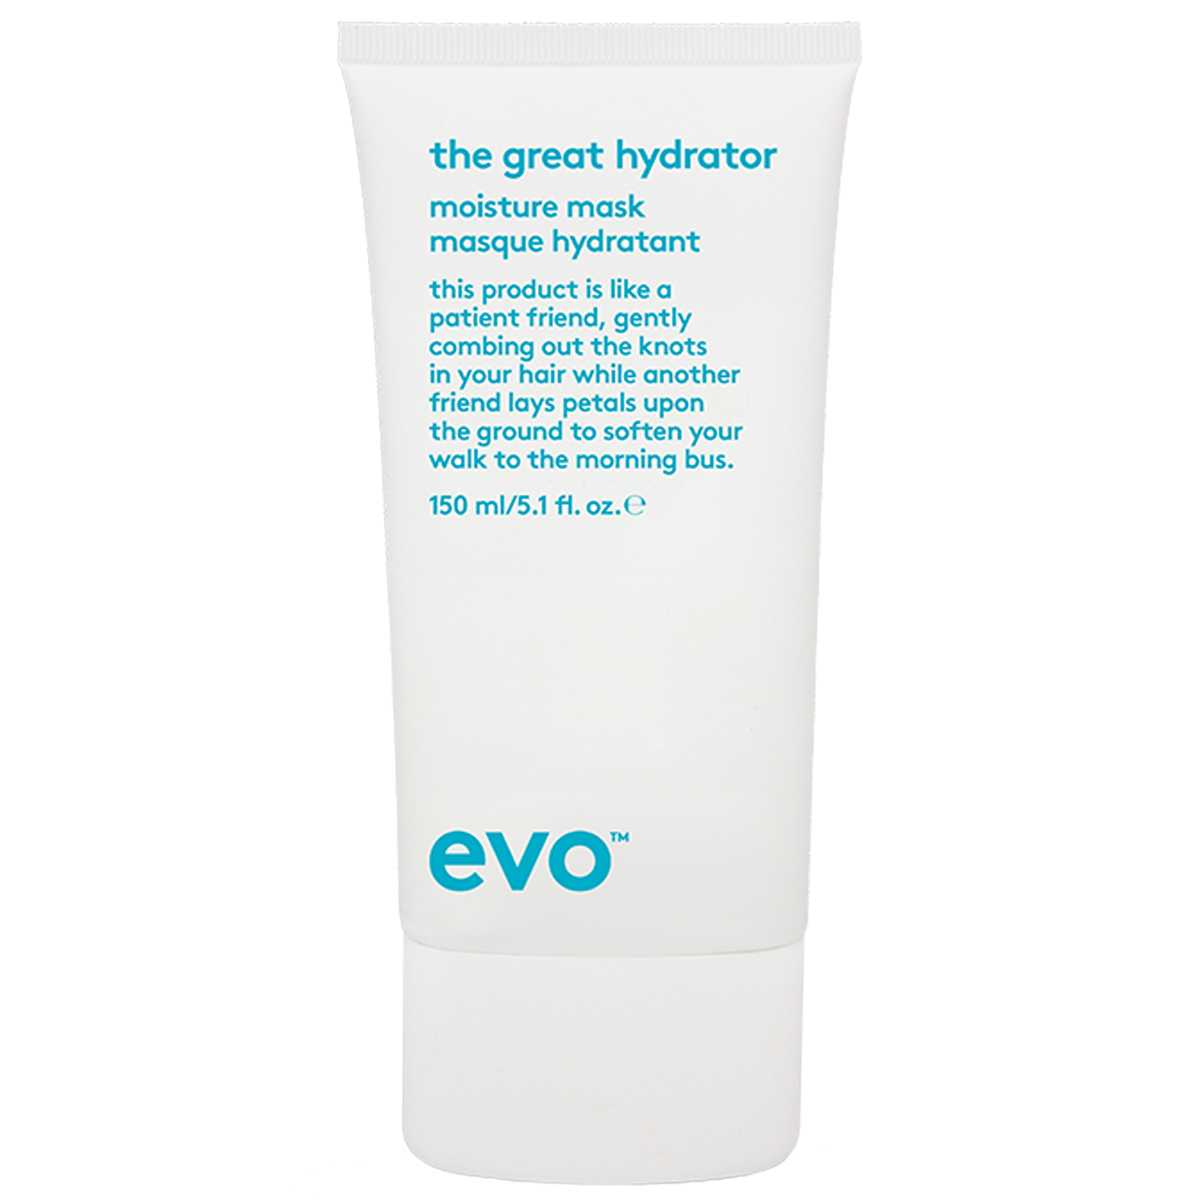 The Great Hydrator Moisture Mask